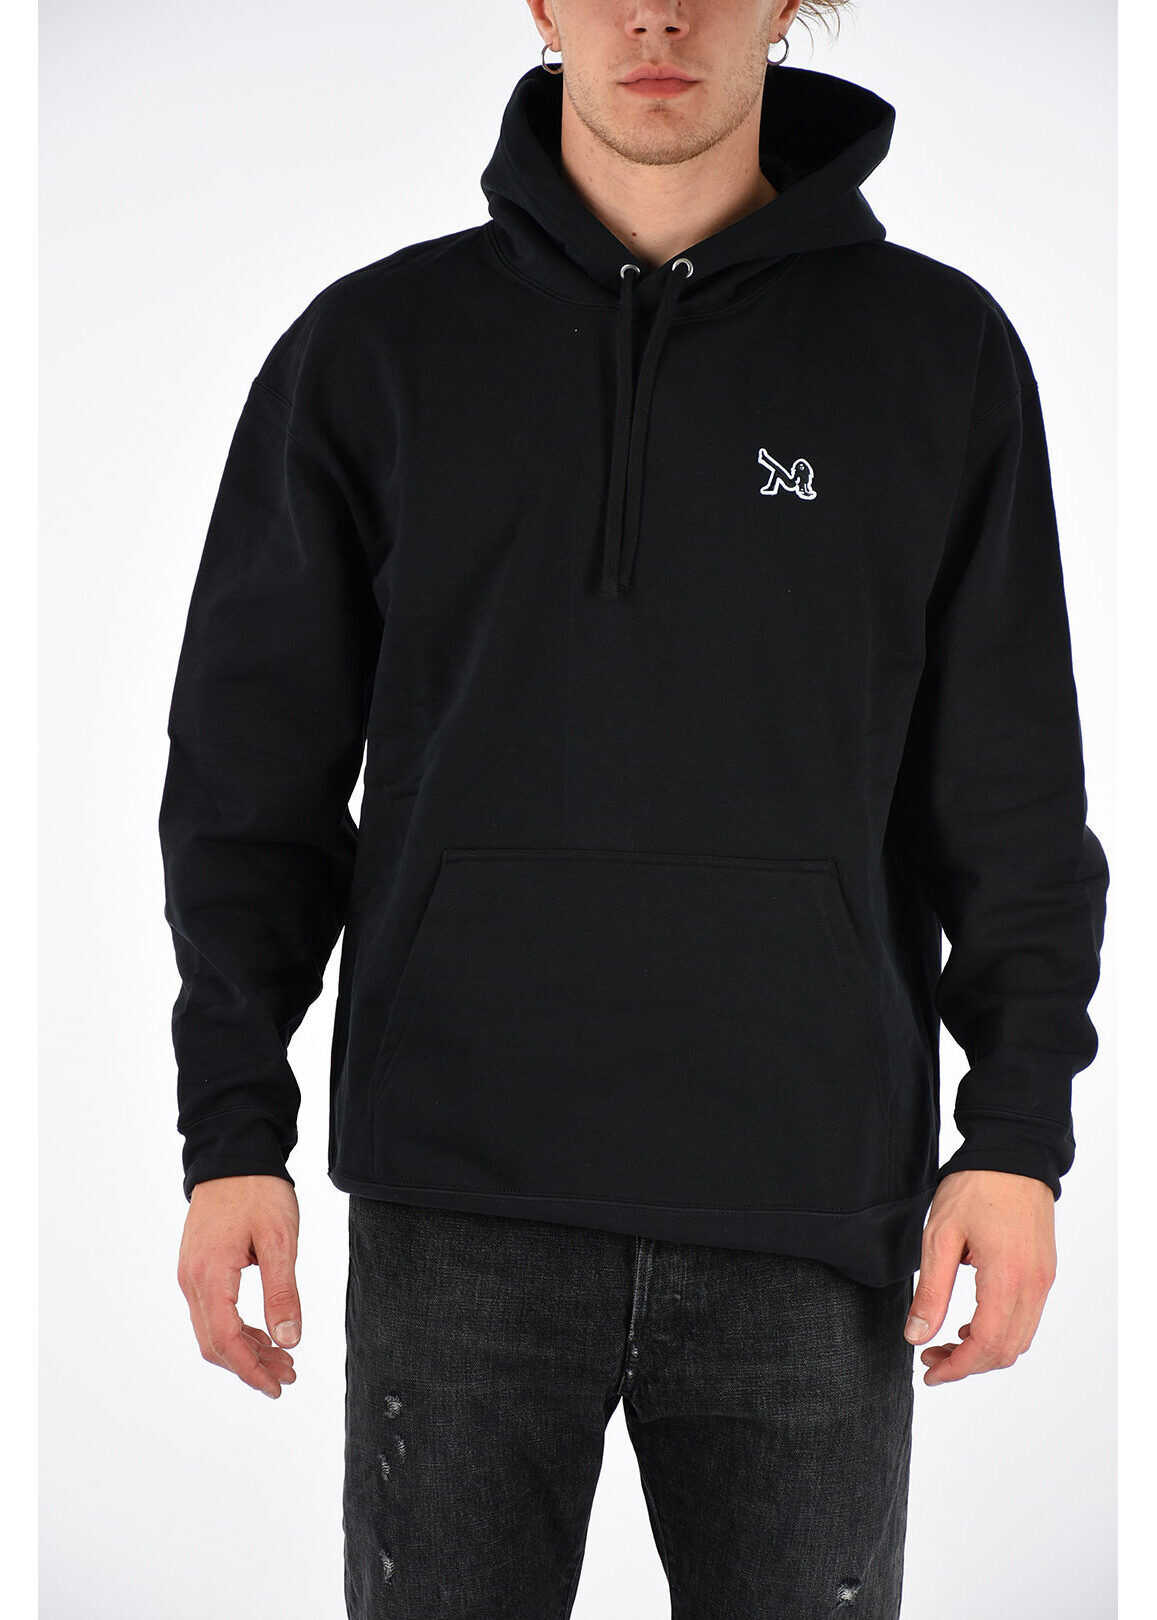 Calvin Klein JEANS EST.1978 Hoodie Sweatshirt BLACK